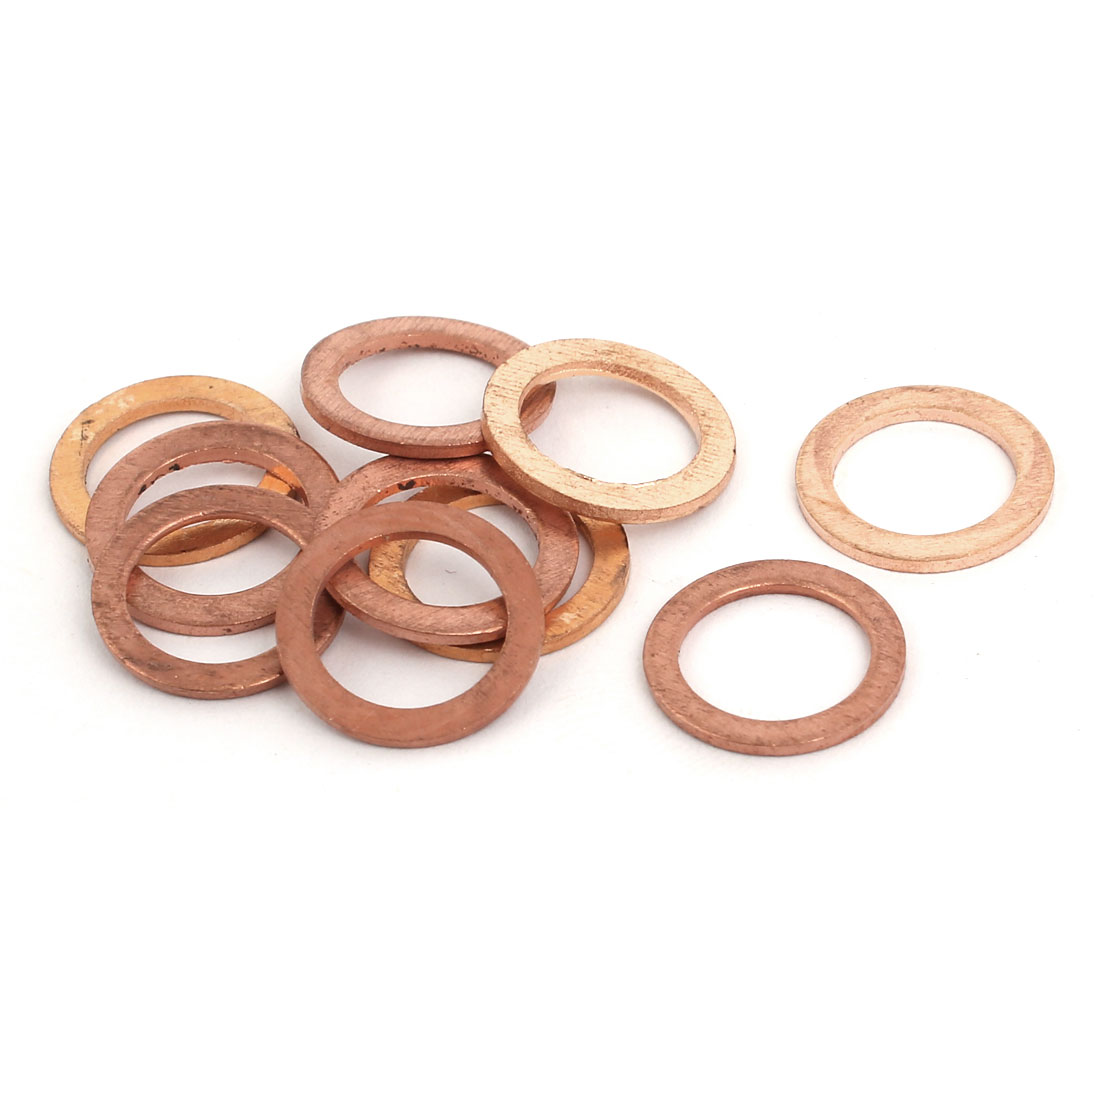 10pcs 10mmx14mmx1mm Copper Flat Ring Sealing Crush Washer Gasket